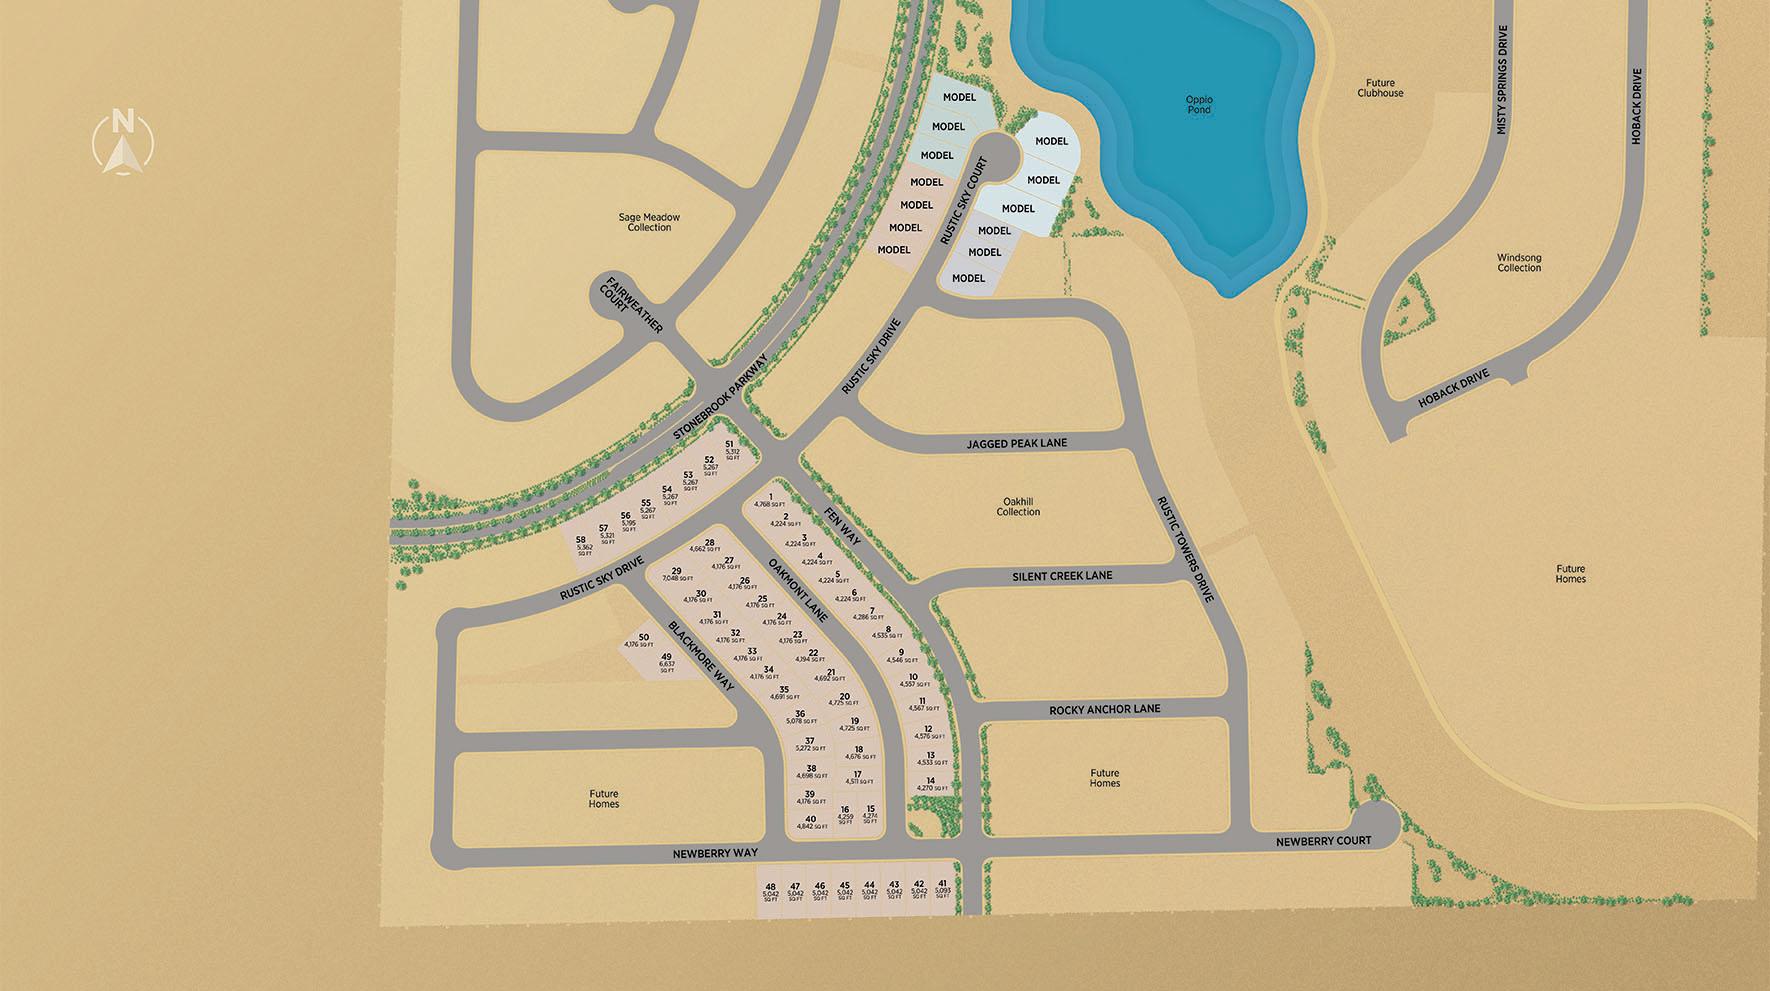 Regency at Stonebrook - Glenridge Collection Site Map